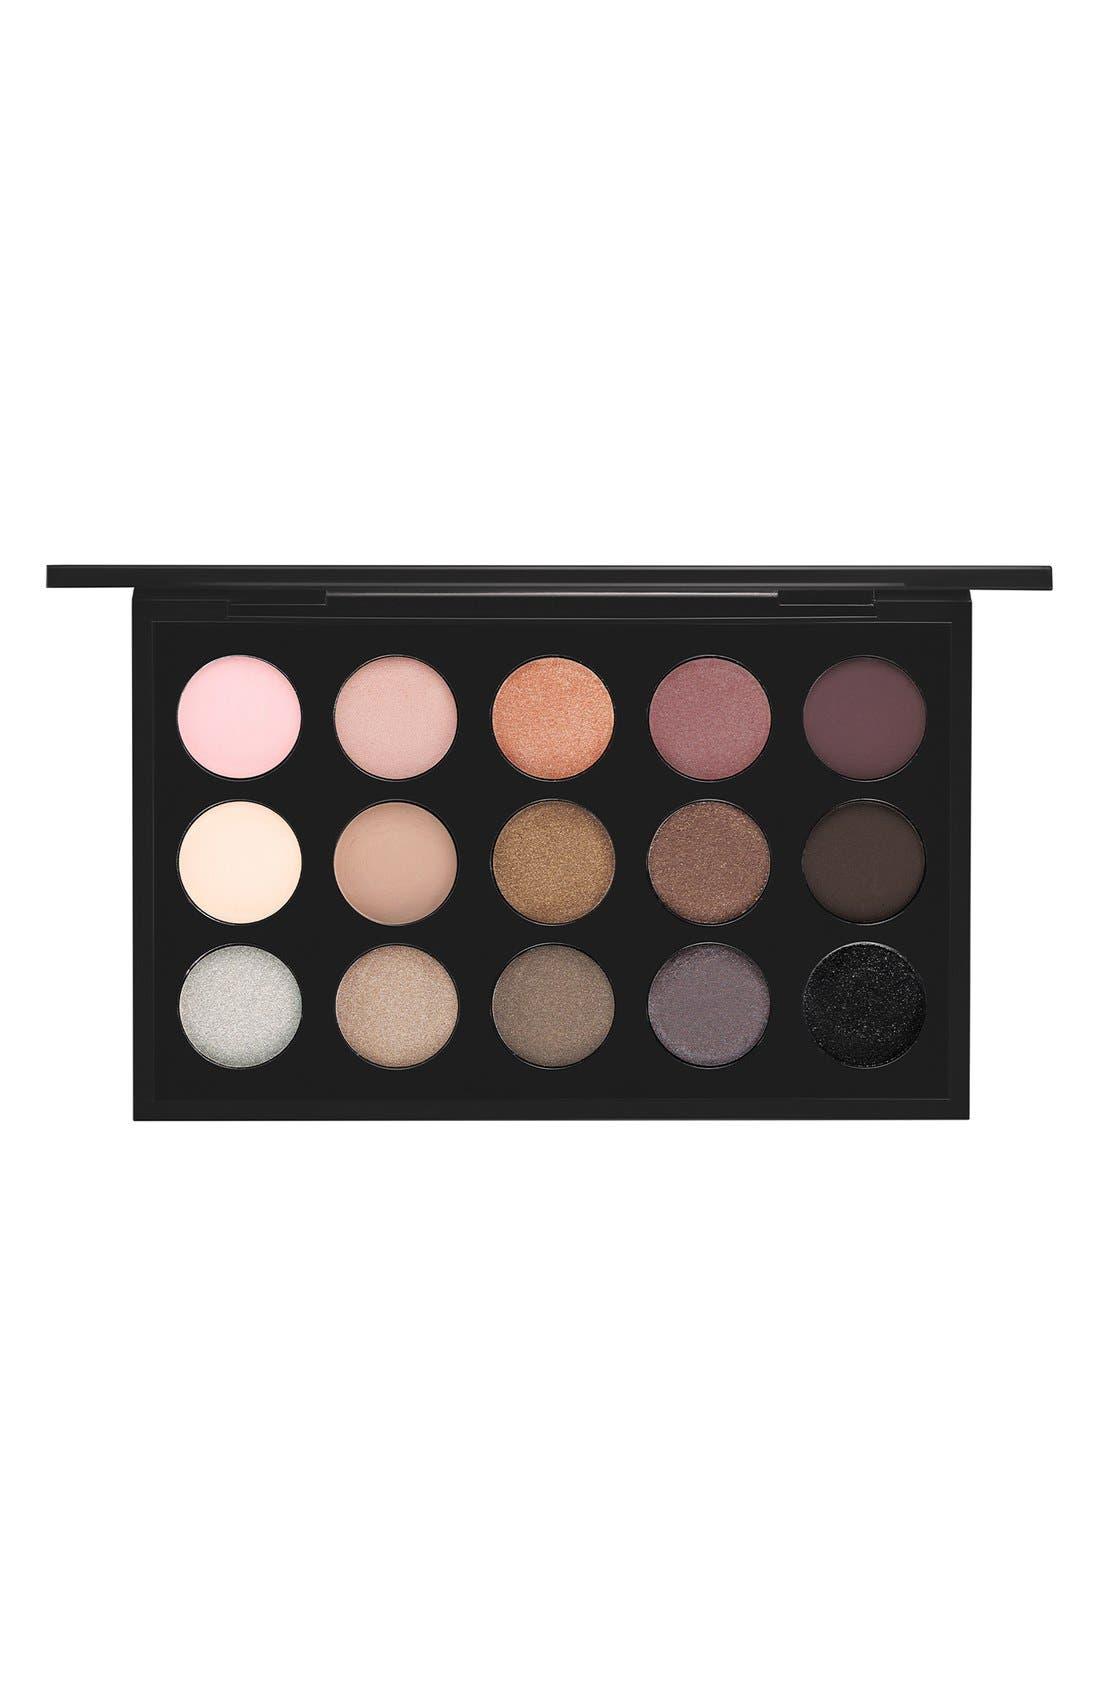 MAC Cool Neutral Times 15 Eyeshadow Palette